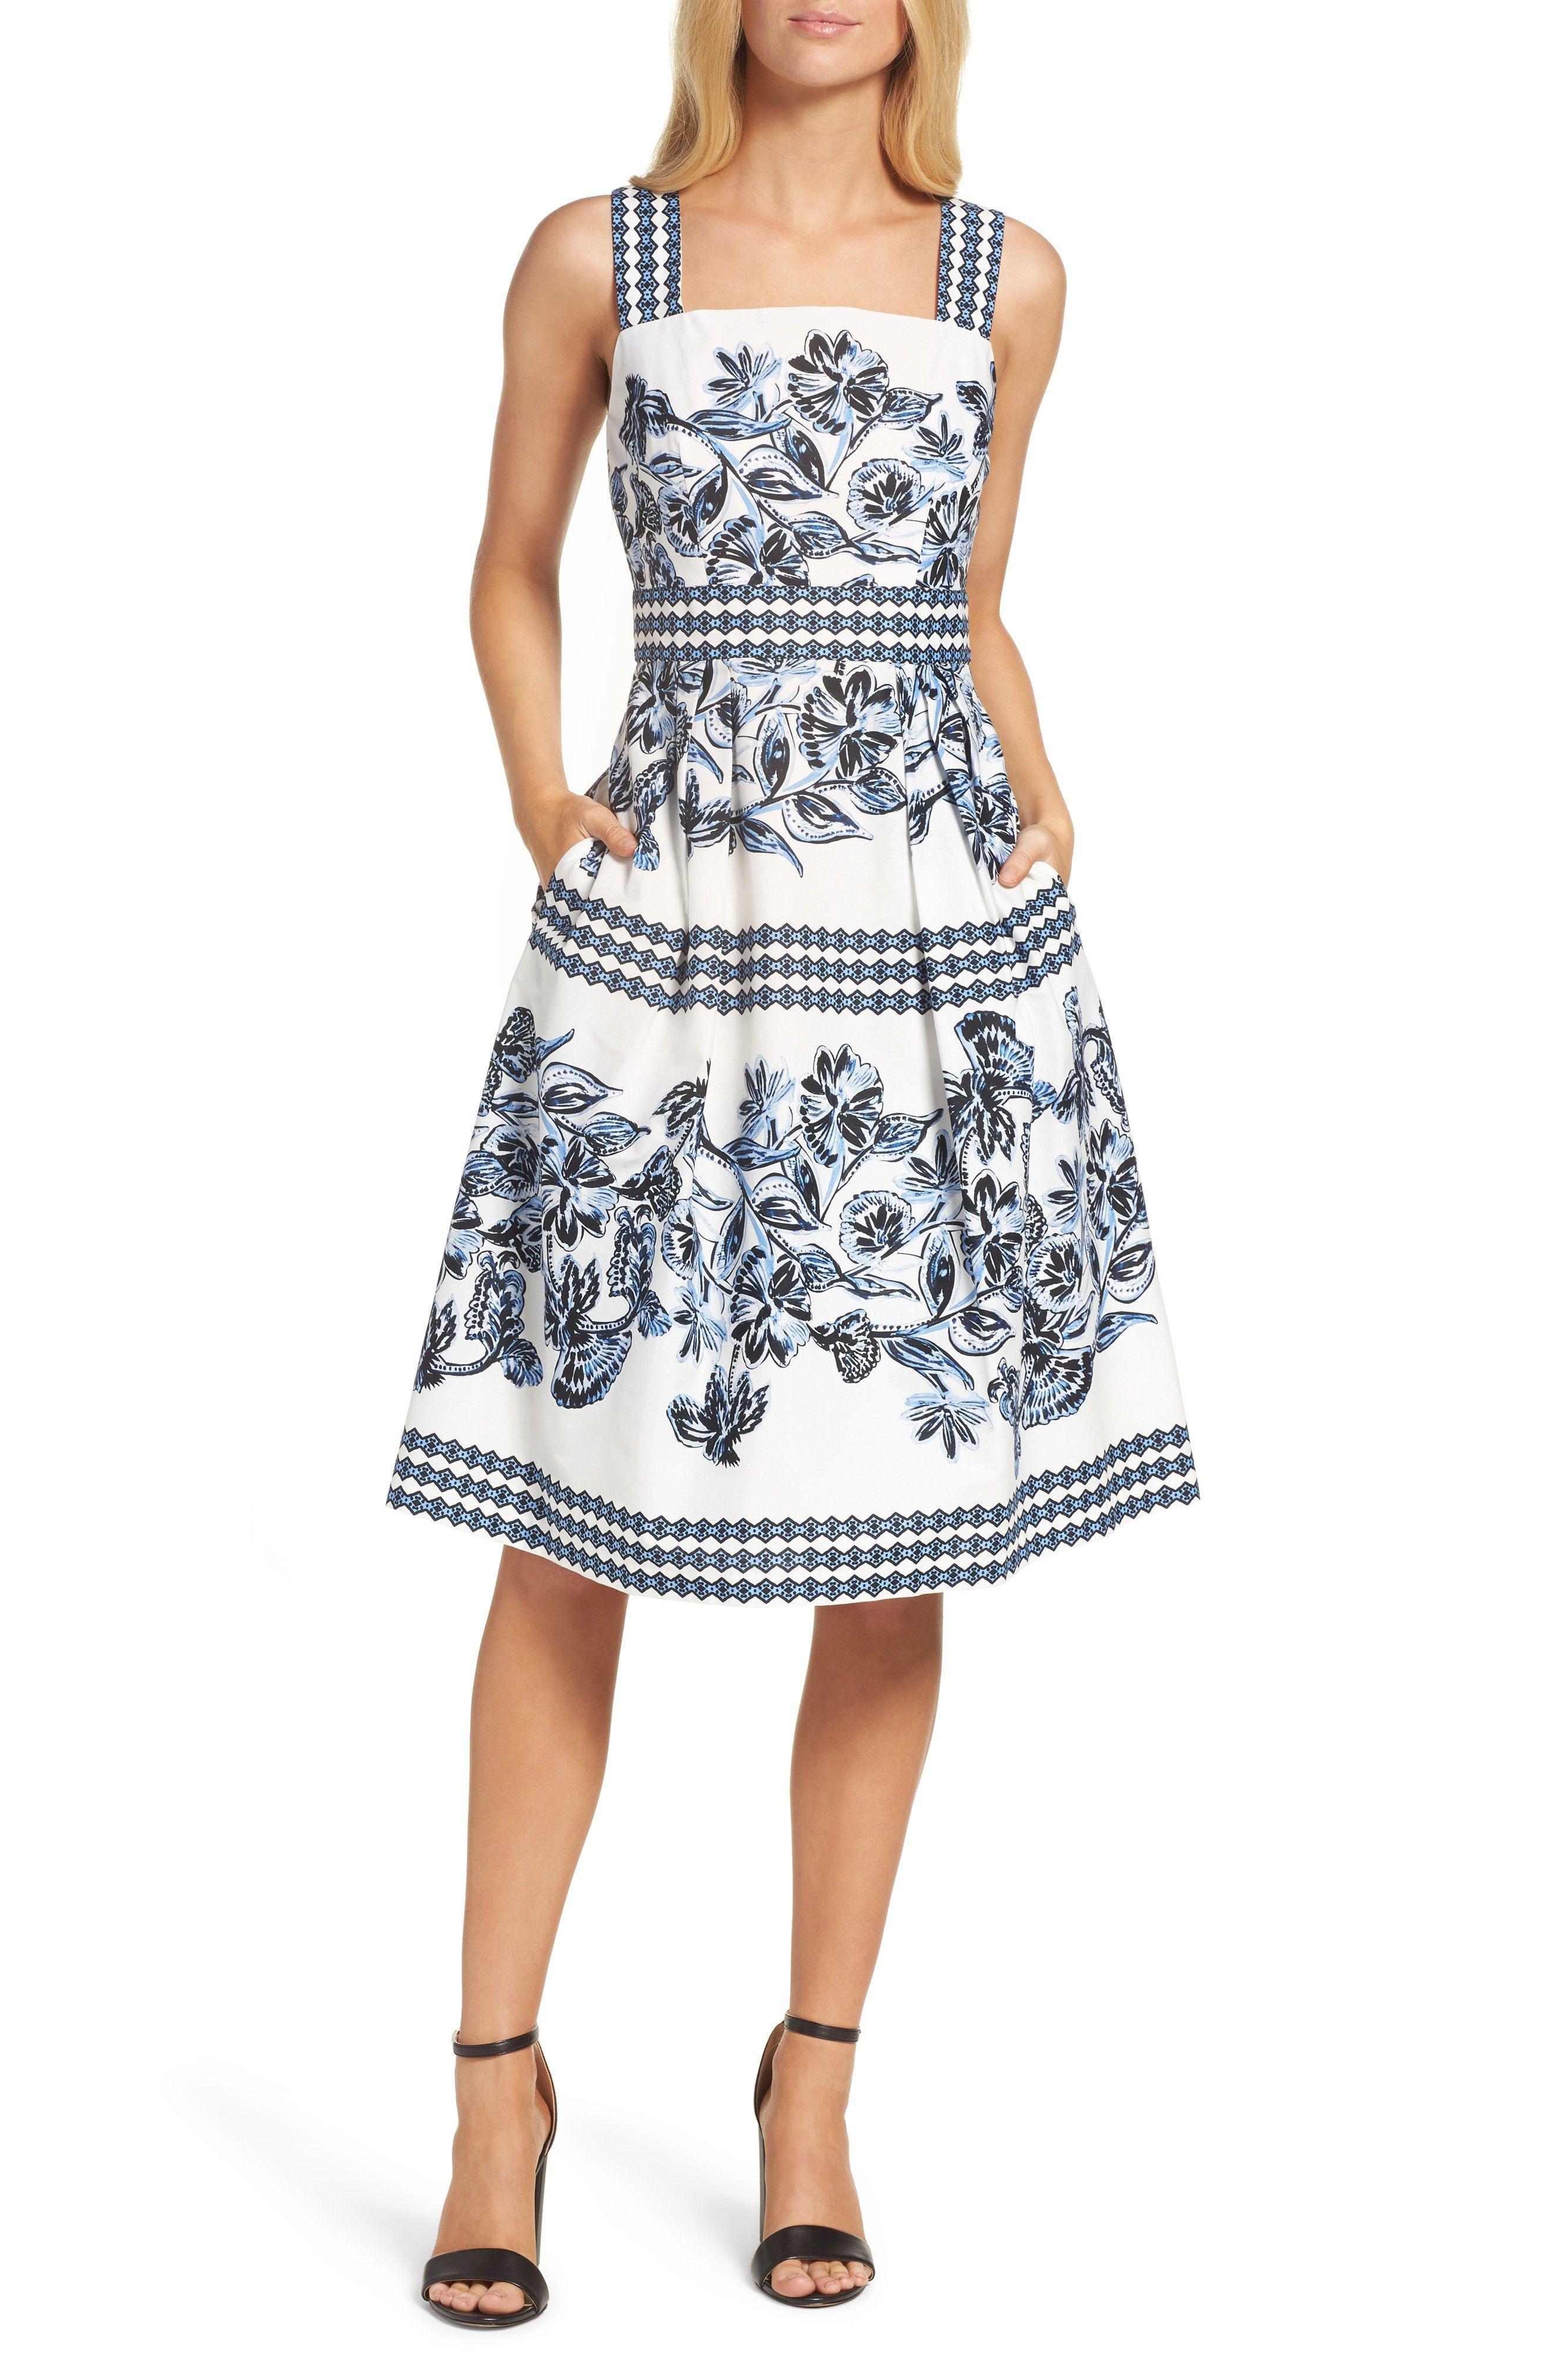 Fit Flare Dress Fit Flare Dress Blue Summer Dresses Flare Dress [ 4048 x 2640 Pixel ]